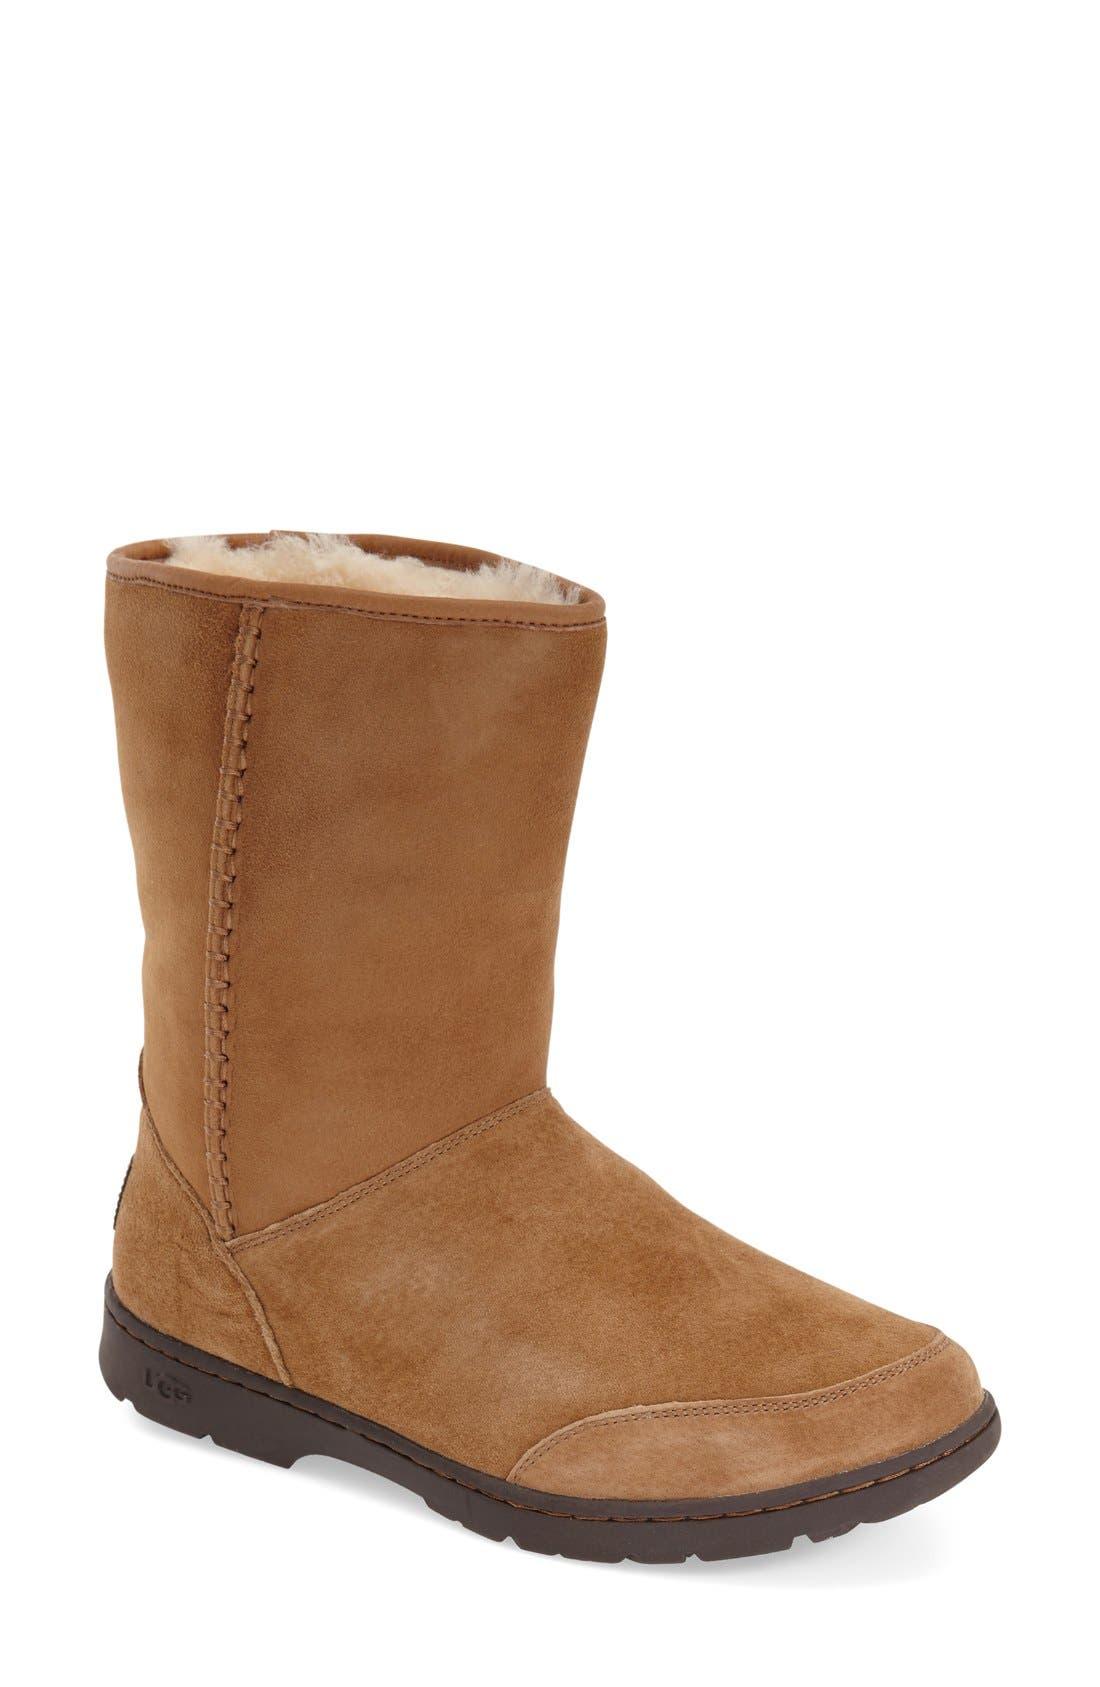 Main Image - UGG®Michaela Waterproof Suede Boot (Women)